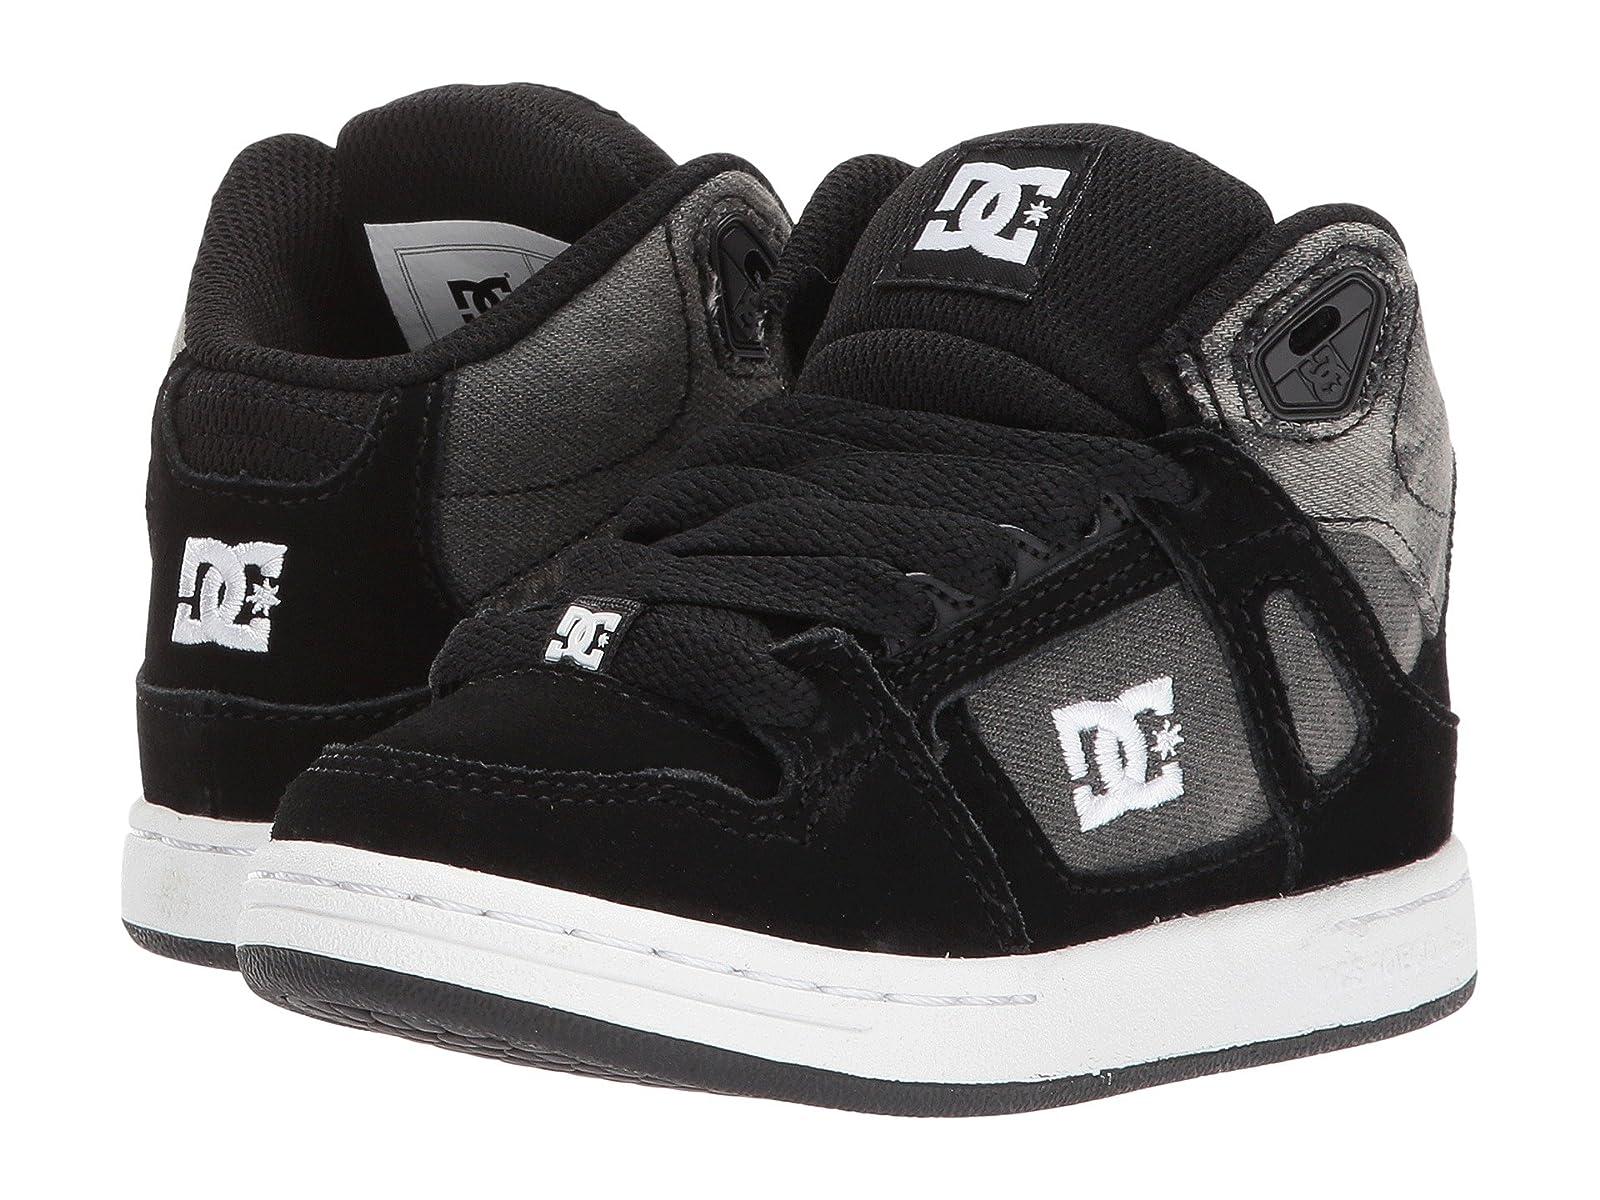 DC Kids Rebound SE (Little Kid/Big Kid)Cheap and distinctive eye-catching shoes